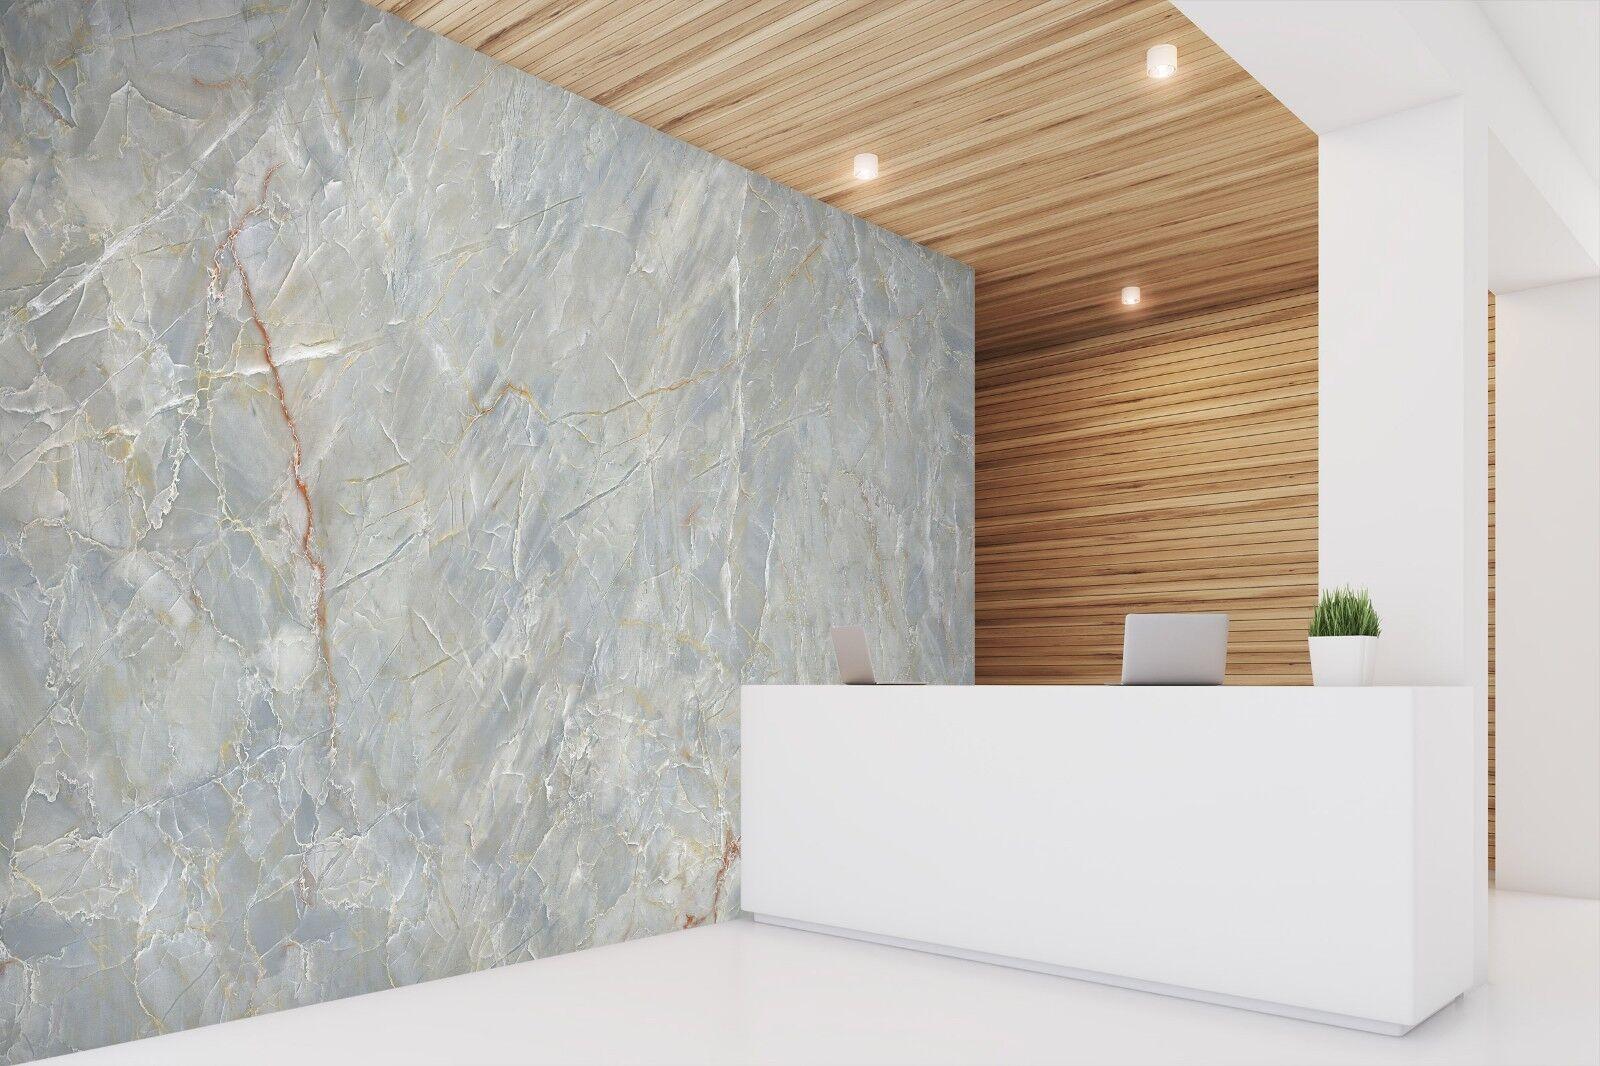 3D Einfach Grau Marmor 2 Textur Fliesen Marmor Tapete Abziehbild Tapete Wandbild